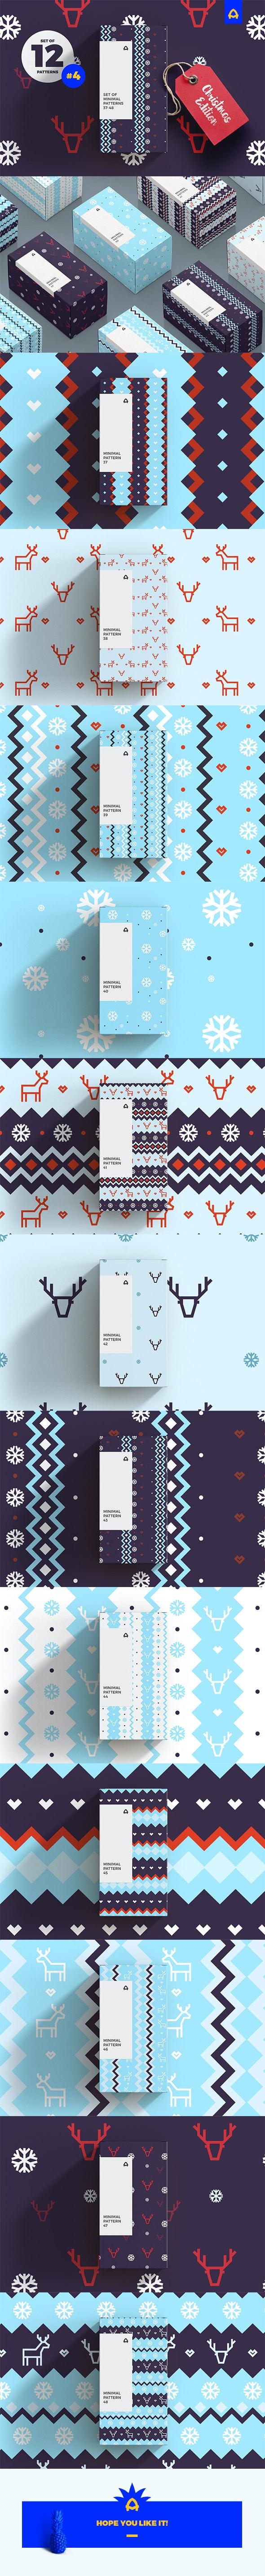 Set of Minimal Christmas Patterns vol. 2 - Textures / Fills / Patterns Illustrator